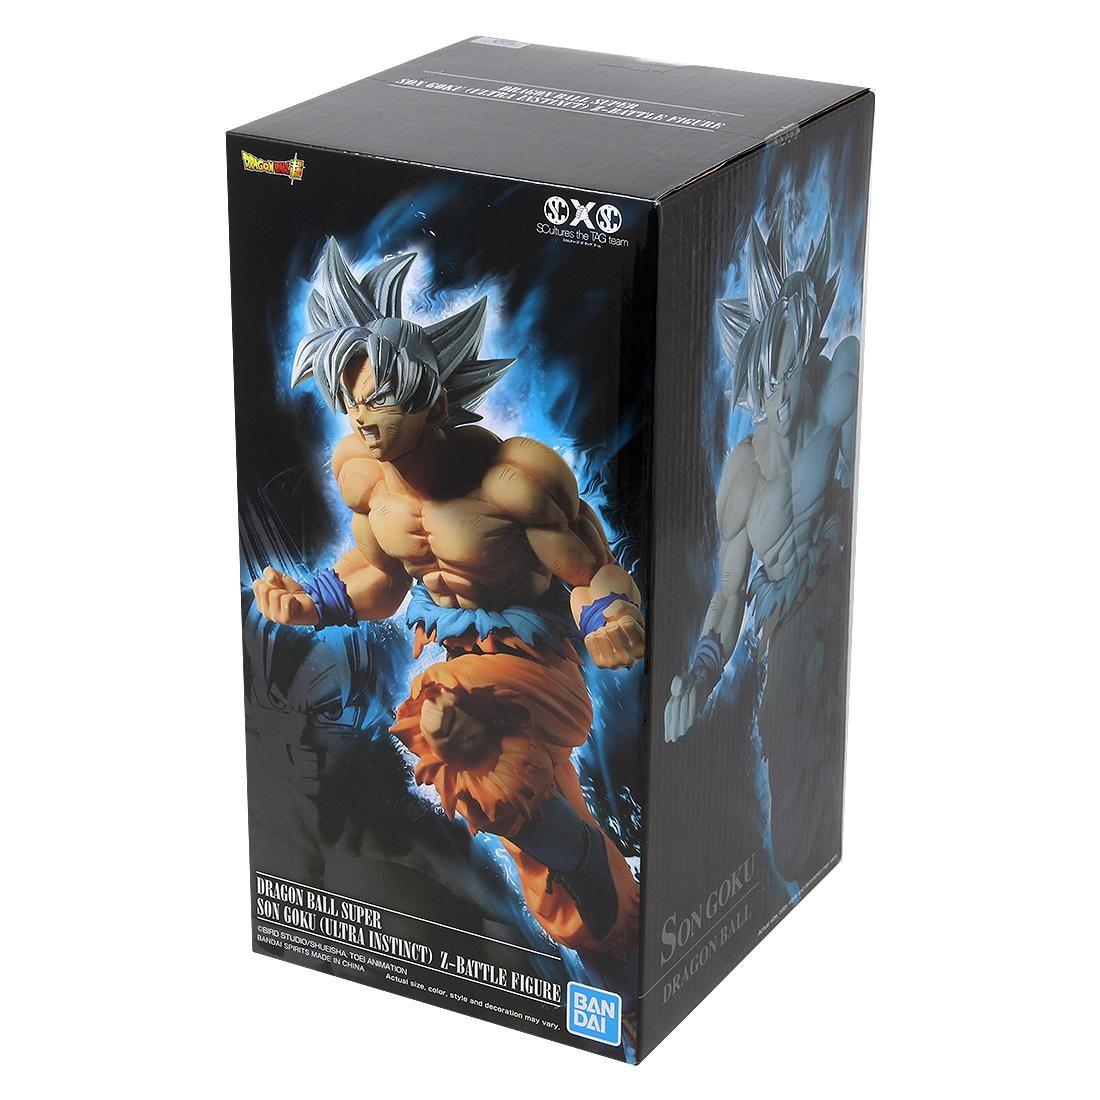 Banpresto The Movie Dragon Ball Super Broly SCultures The TAG Team Son Goku Ultra Instinct Z-Battle Figure